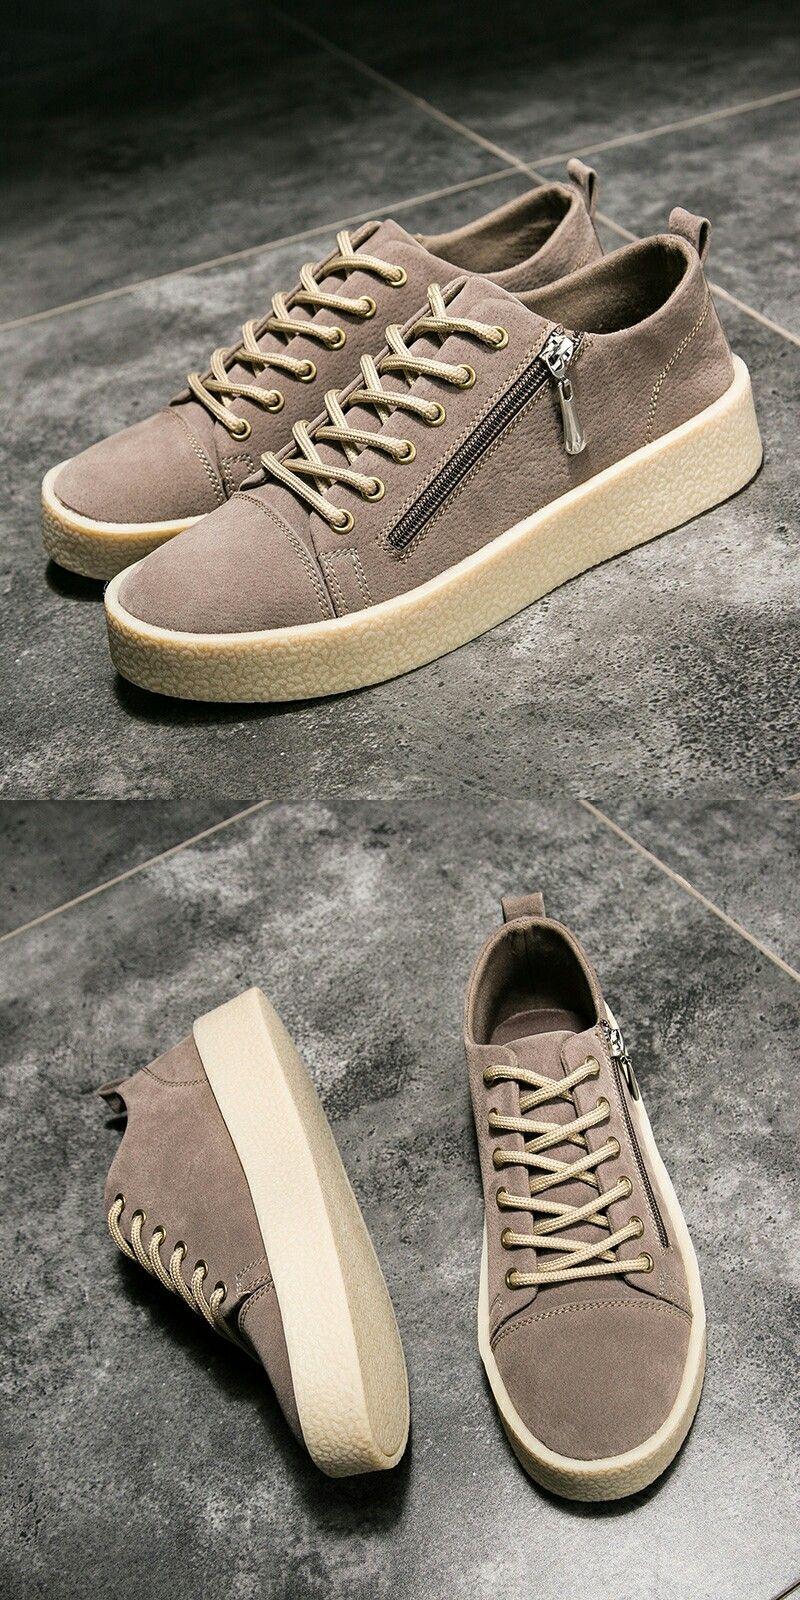 Sapatos Exóticos Masculinos | Modelos de sapatos, Sapatos